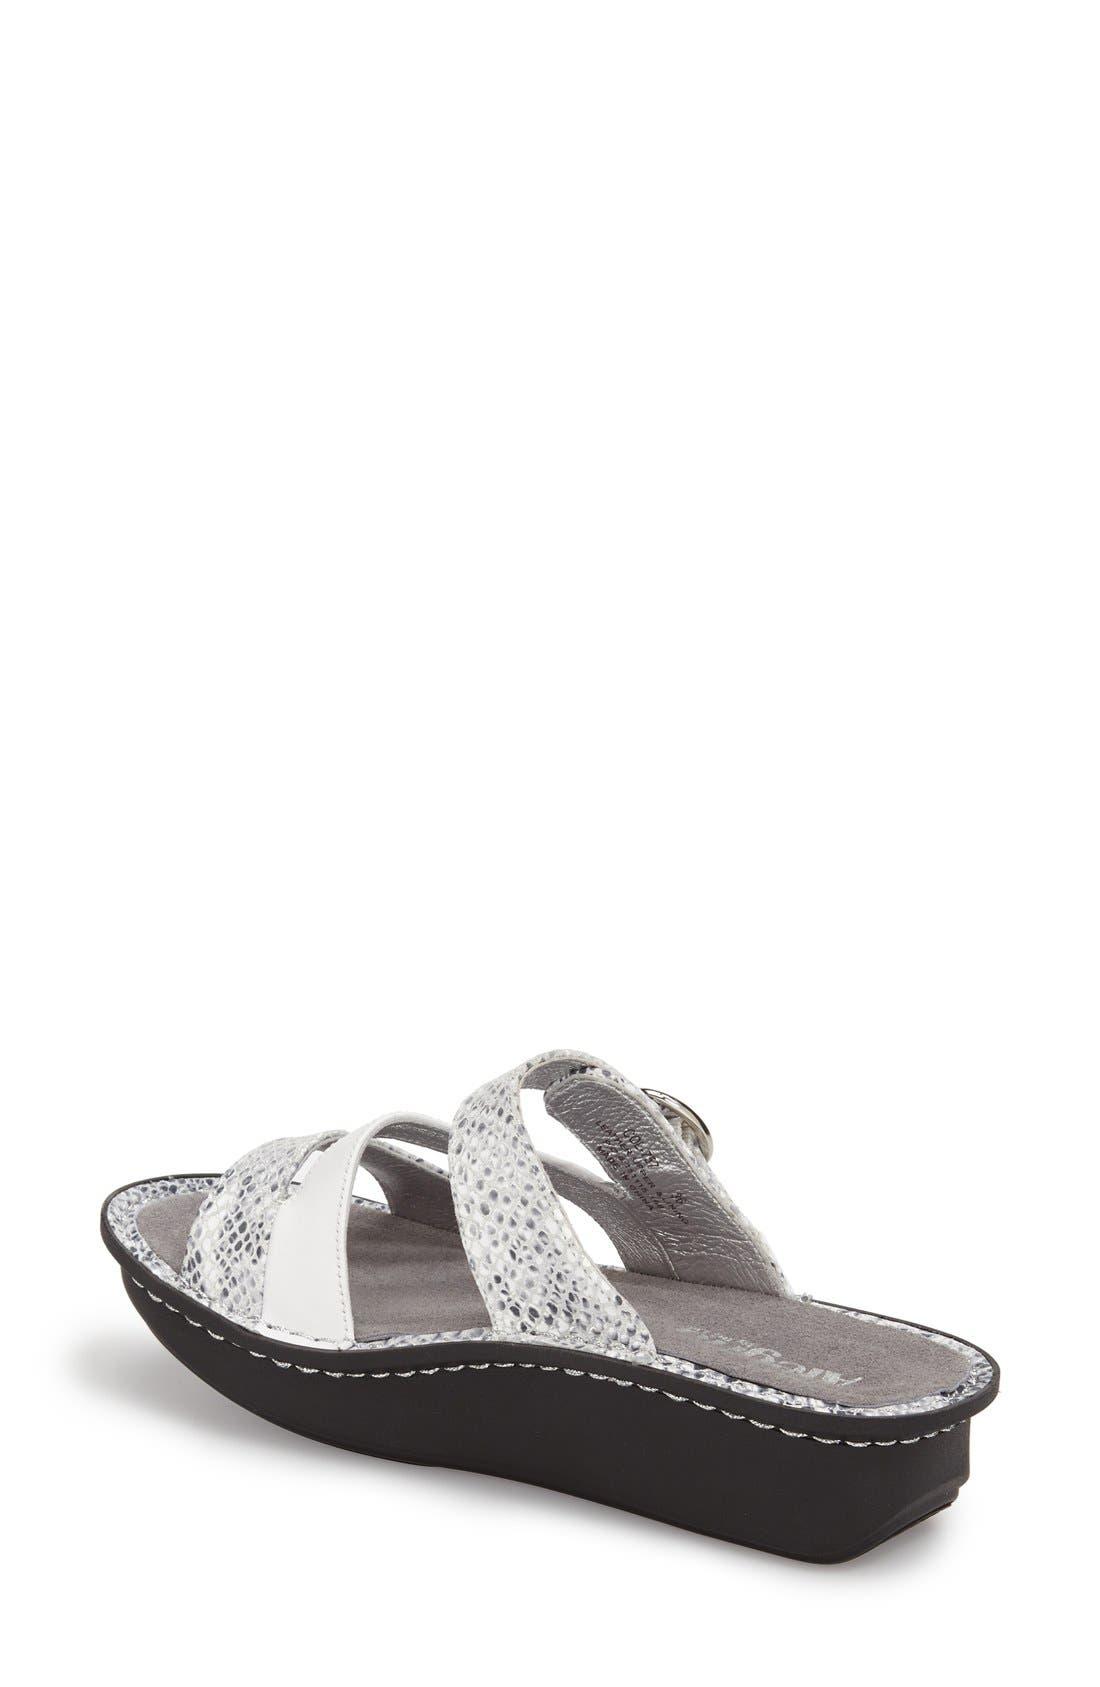 'Colette' Platform Sandal,                             Alternate thumbnail 53, color,